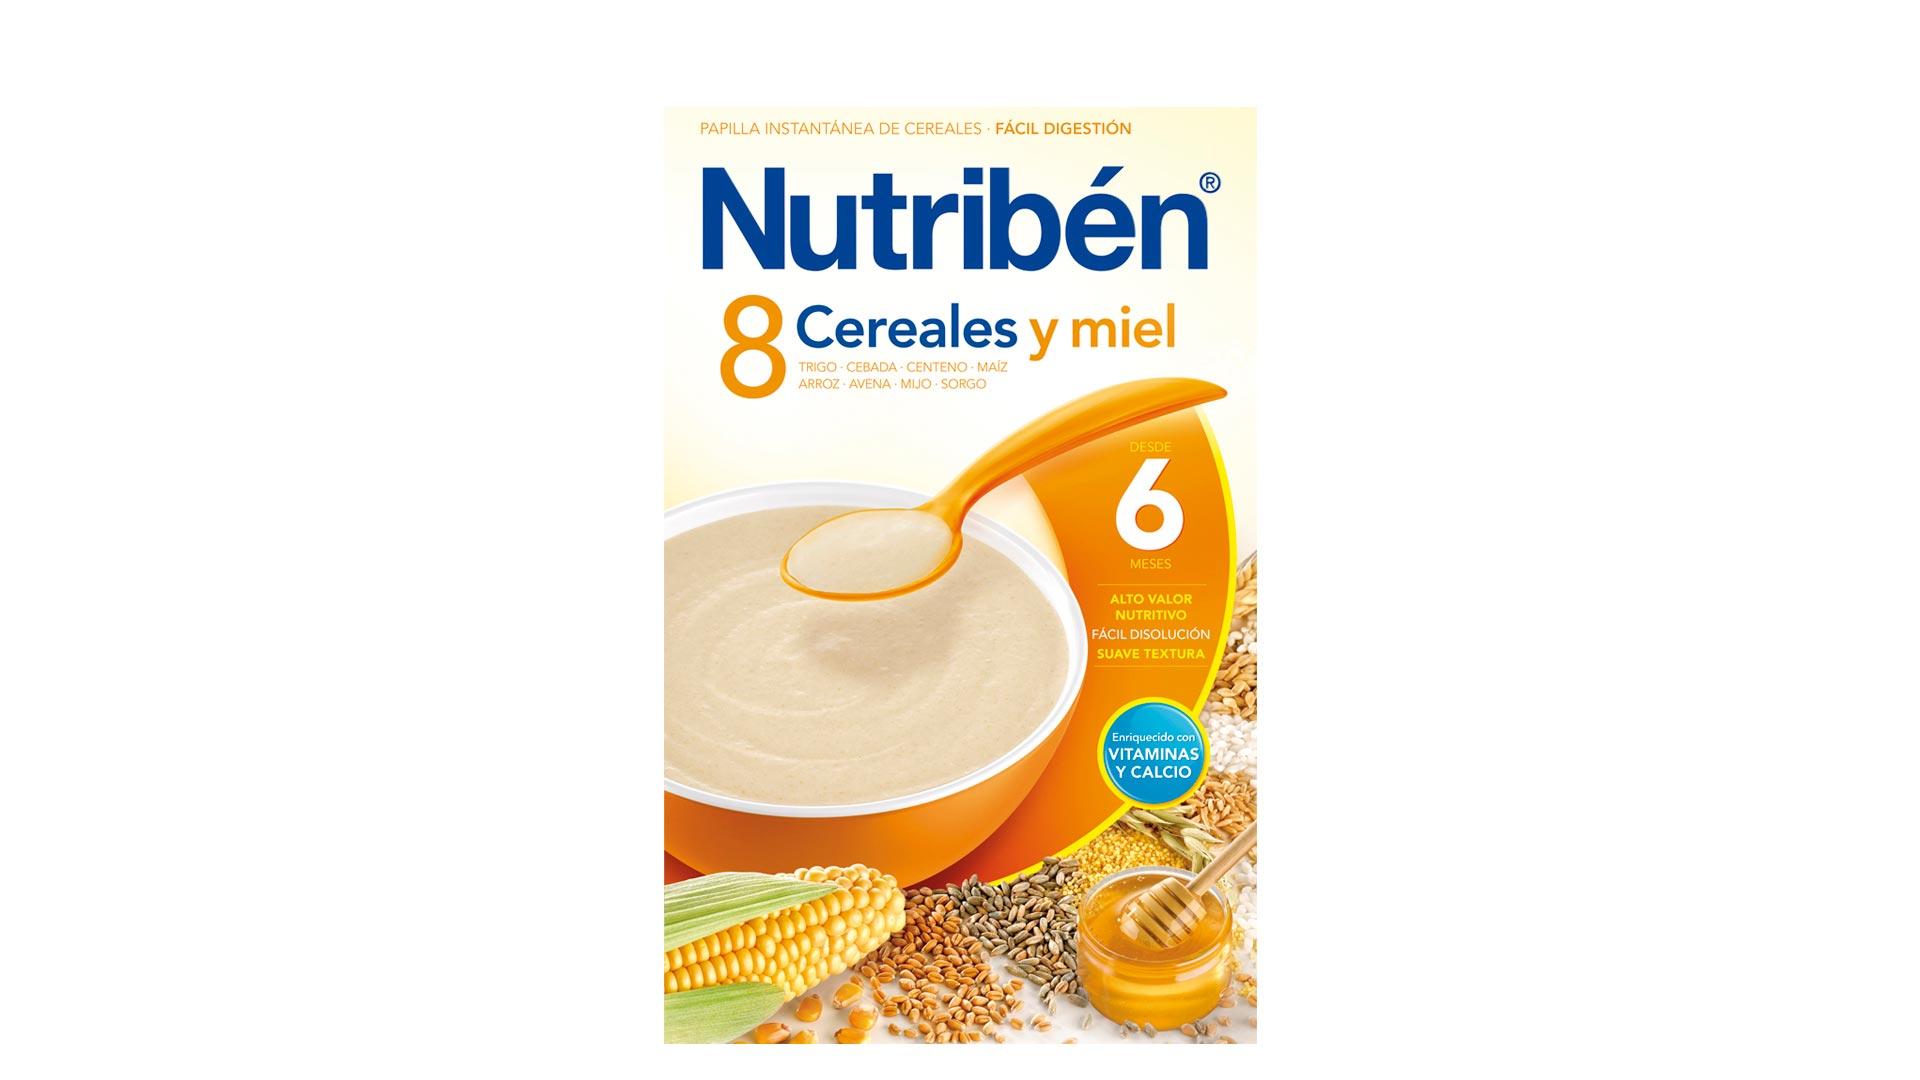 pk_f3p2b-nutriben-01